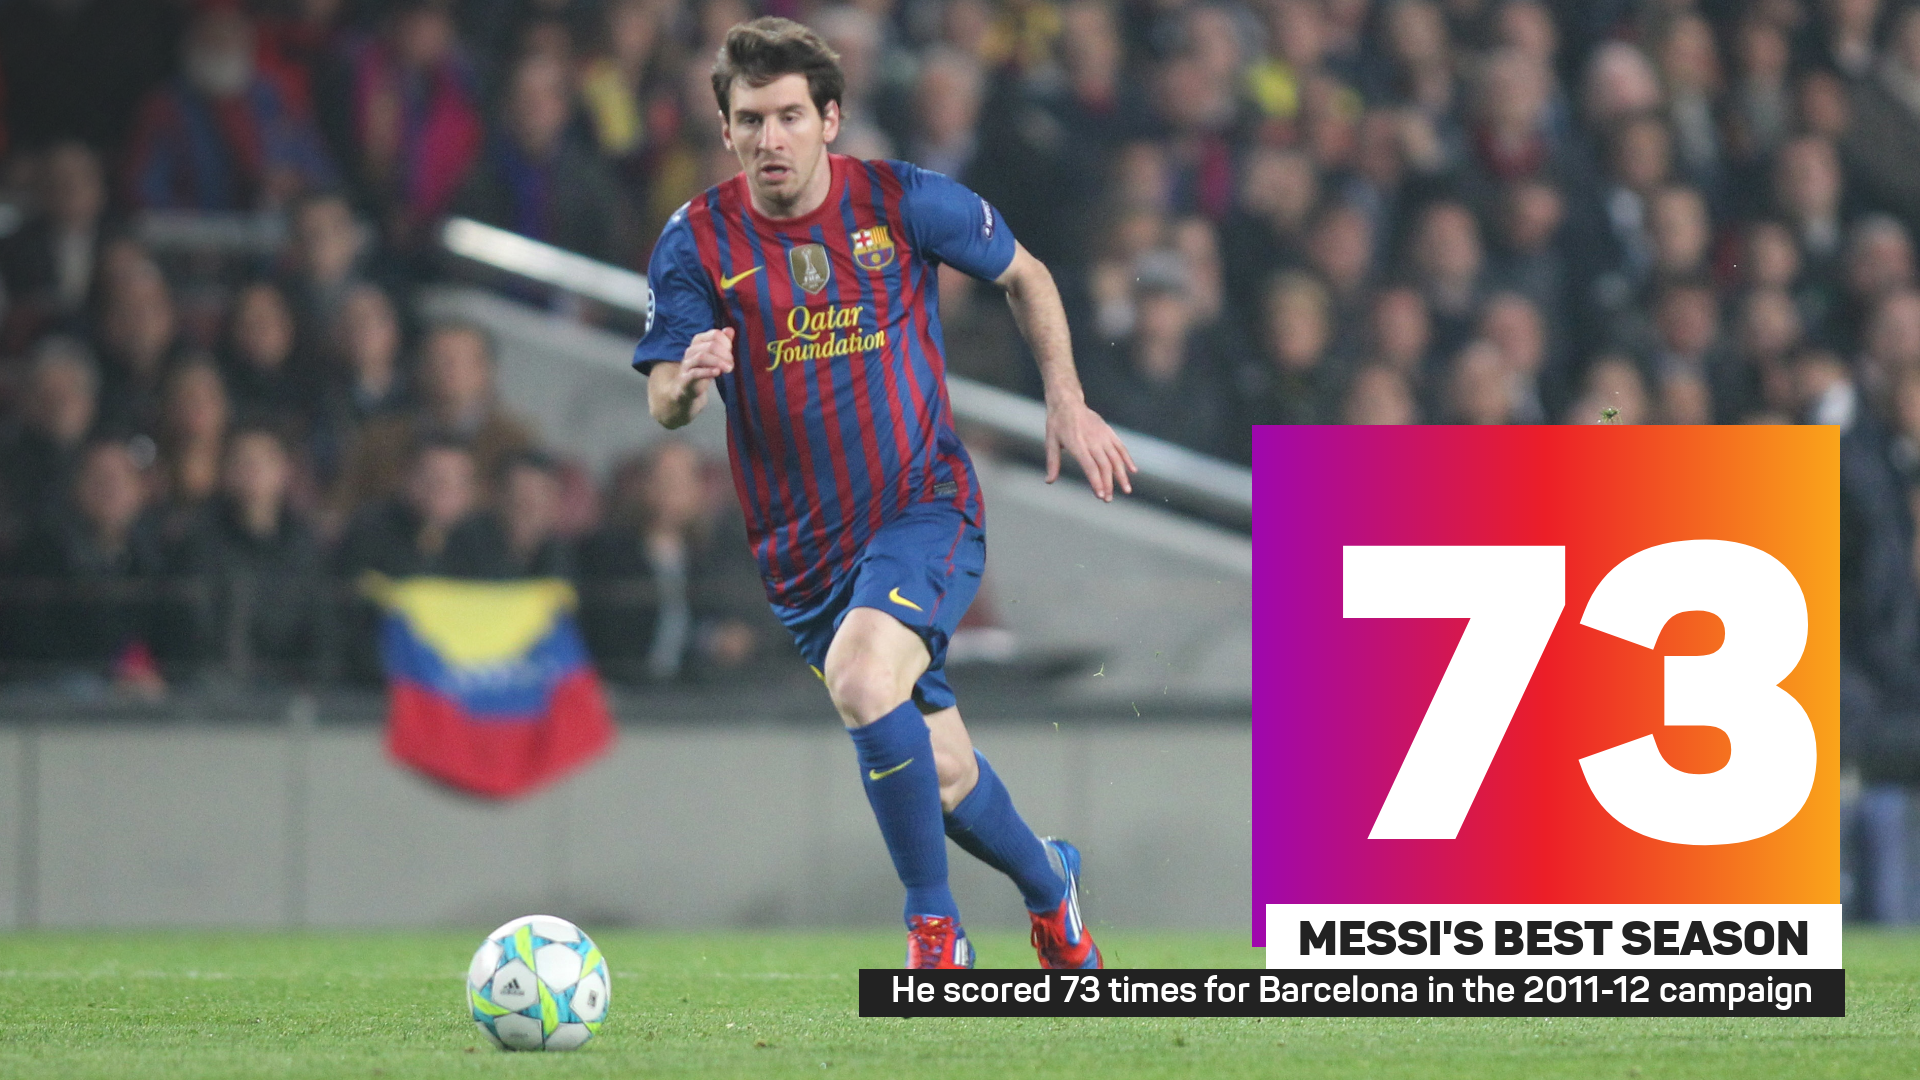 Lionel Messi's 73-goal season